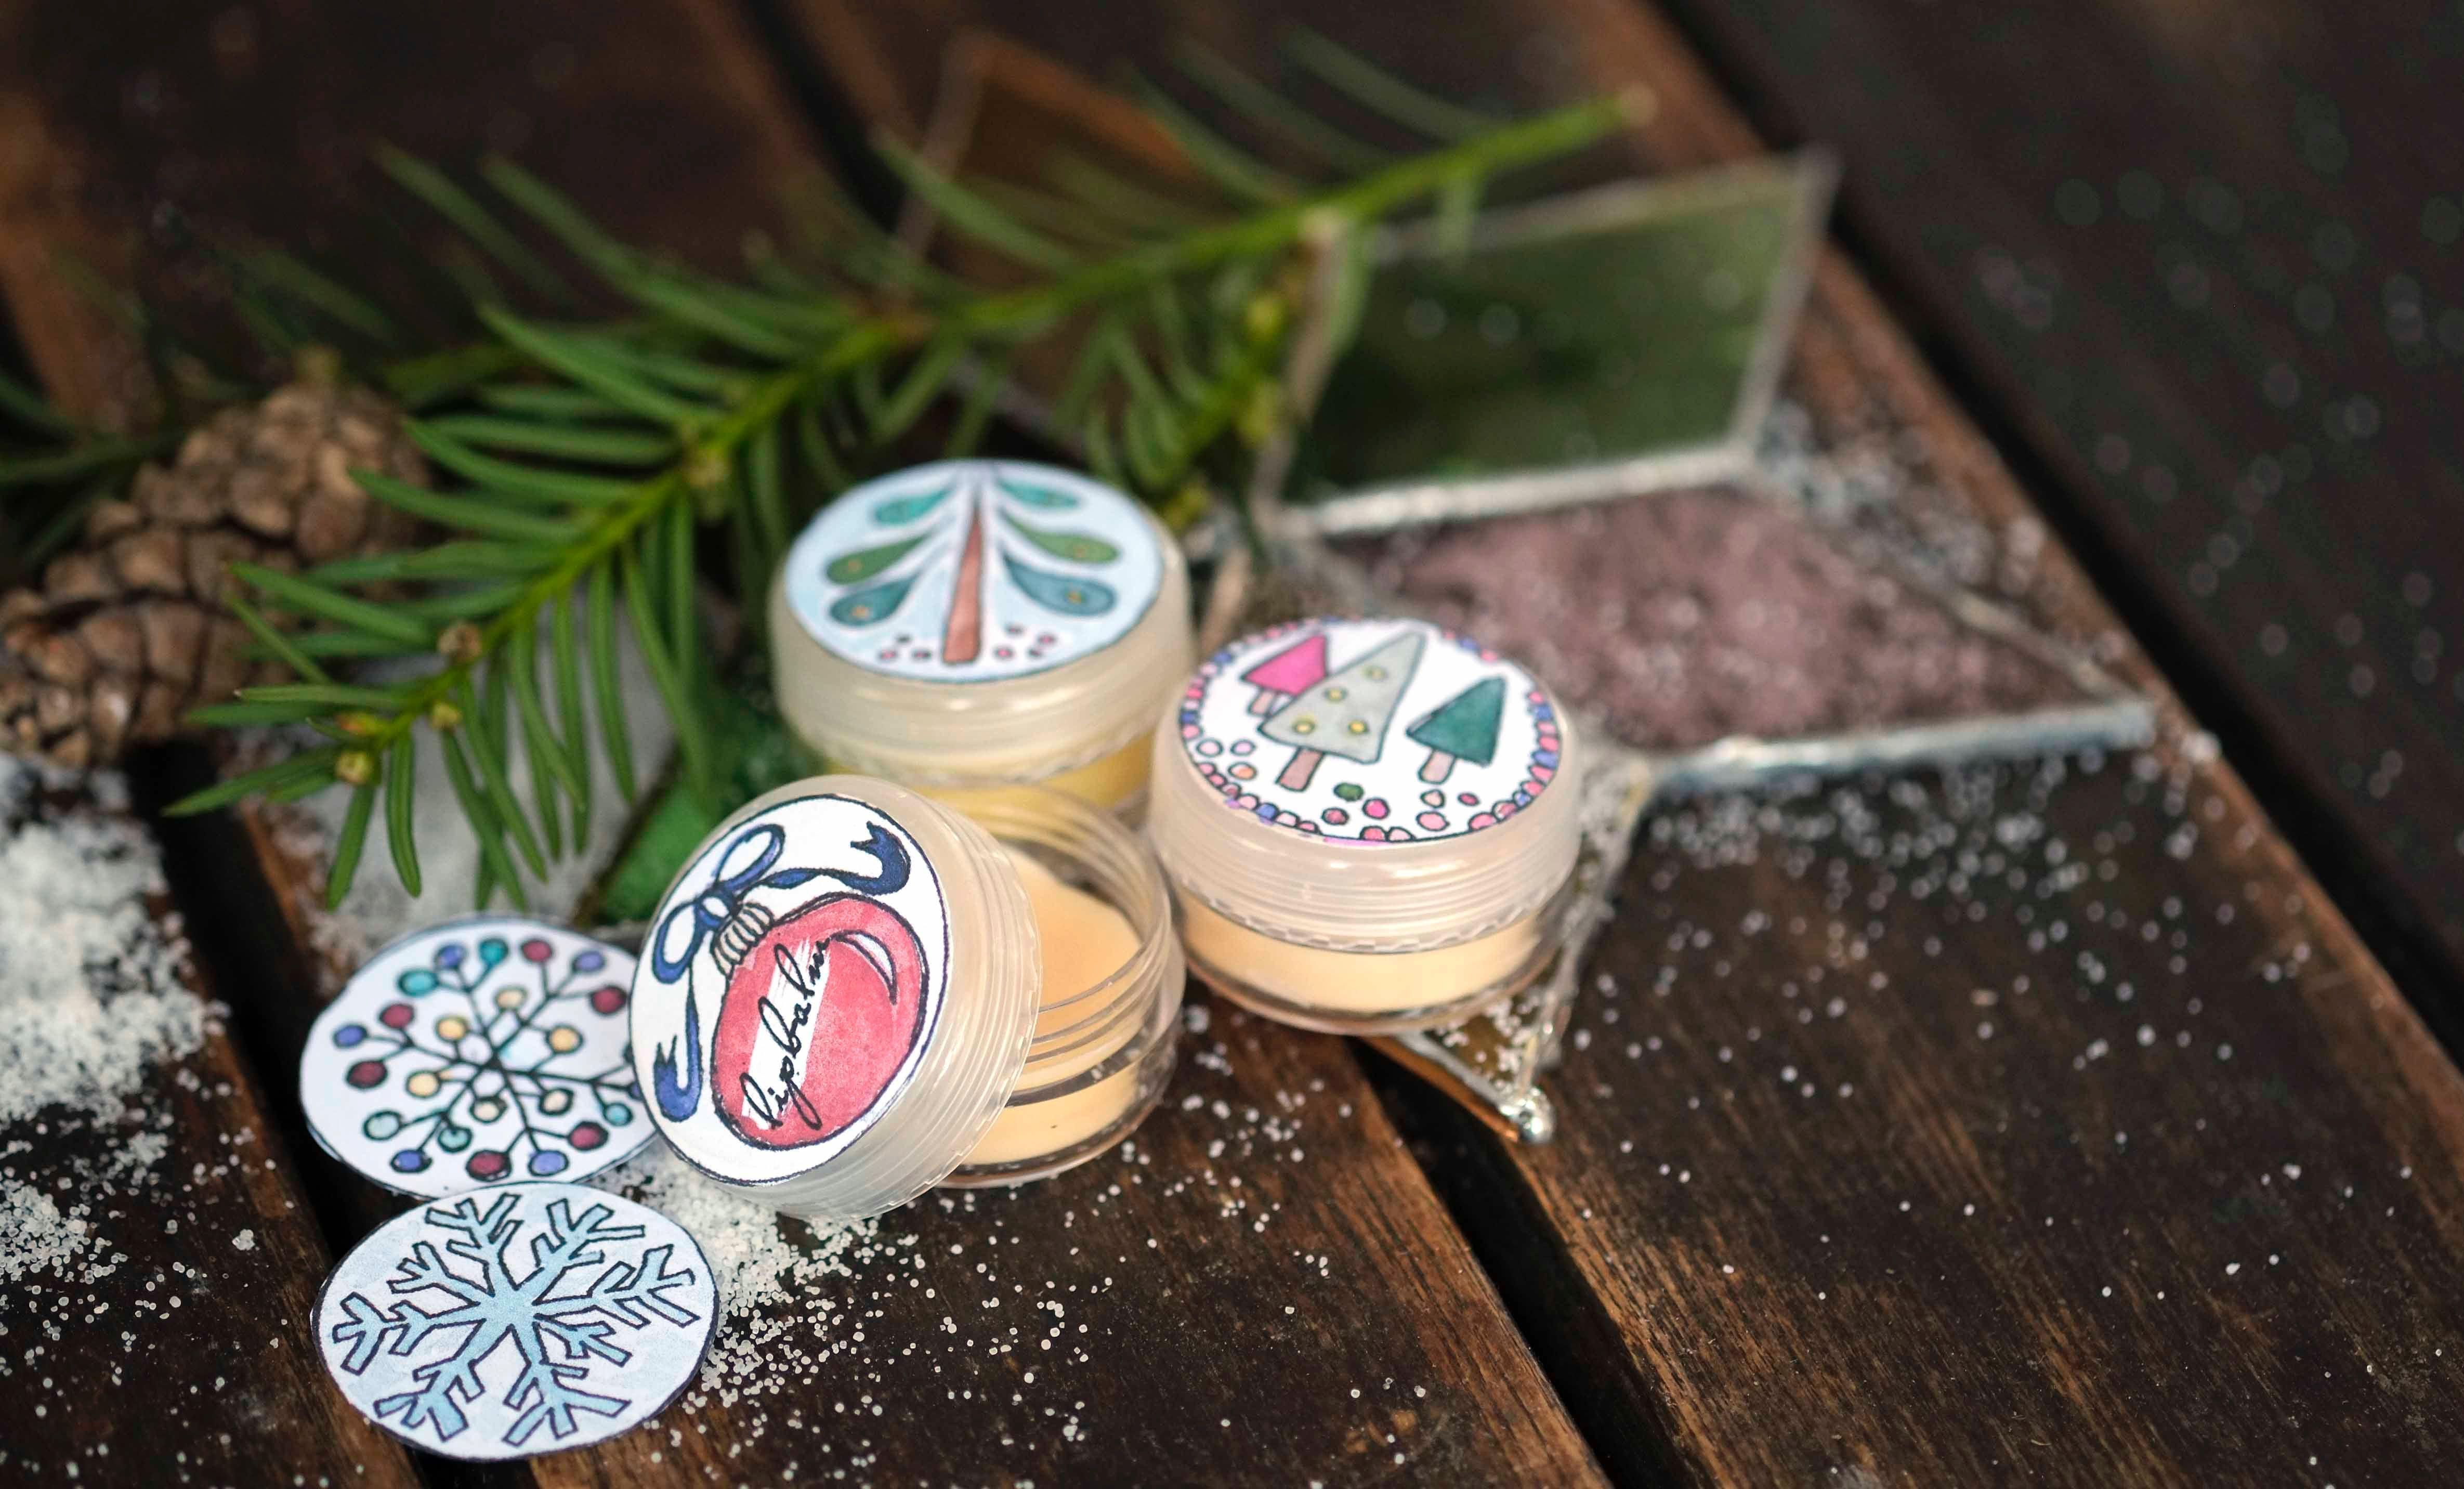 lippenpflege selber machen etikettenvorlagen naturseife. Black Bedroom Furniture Sets. Home Design Ideas